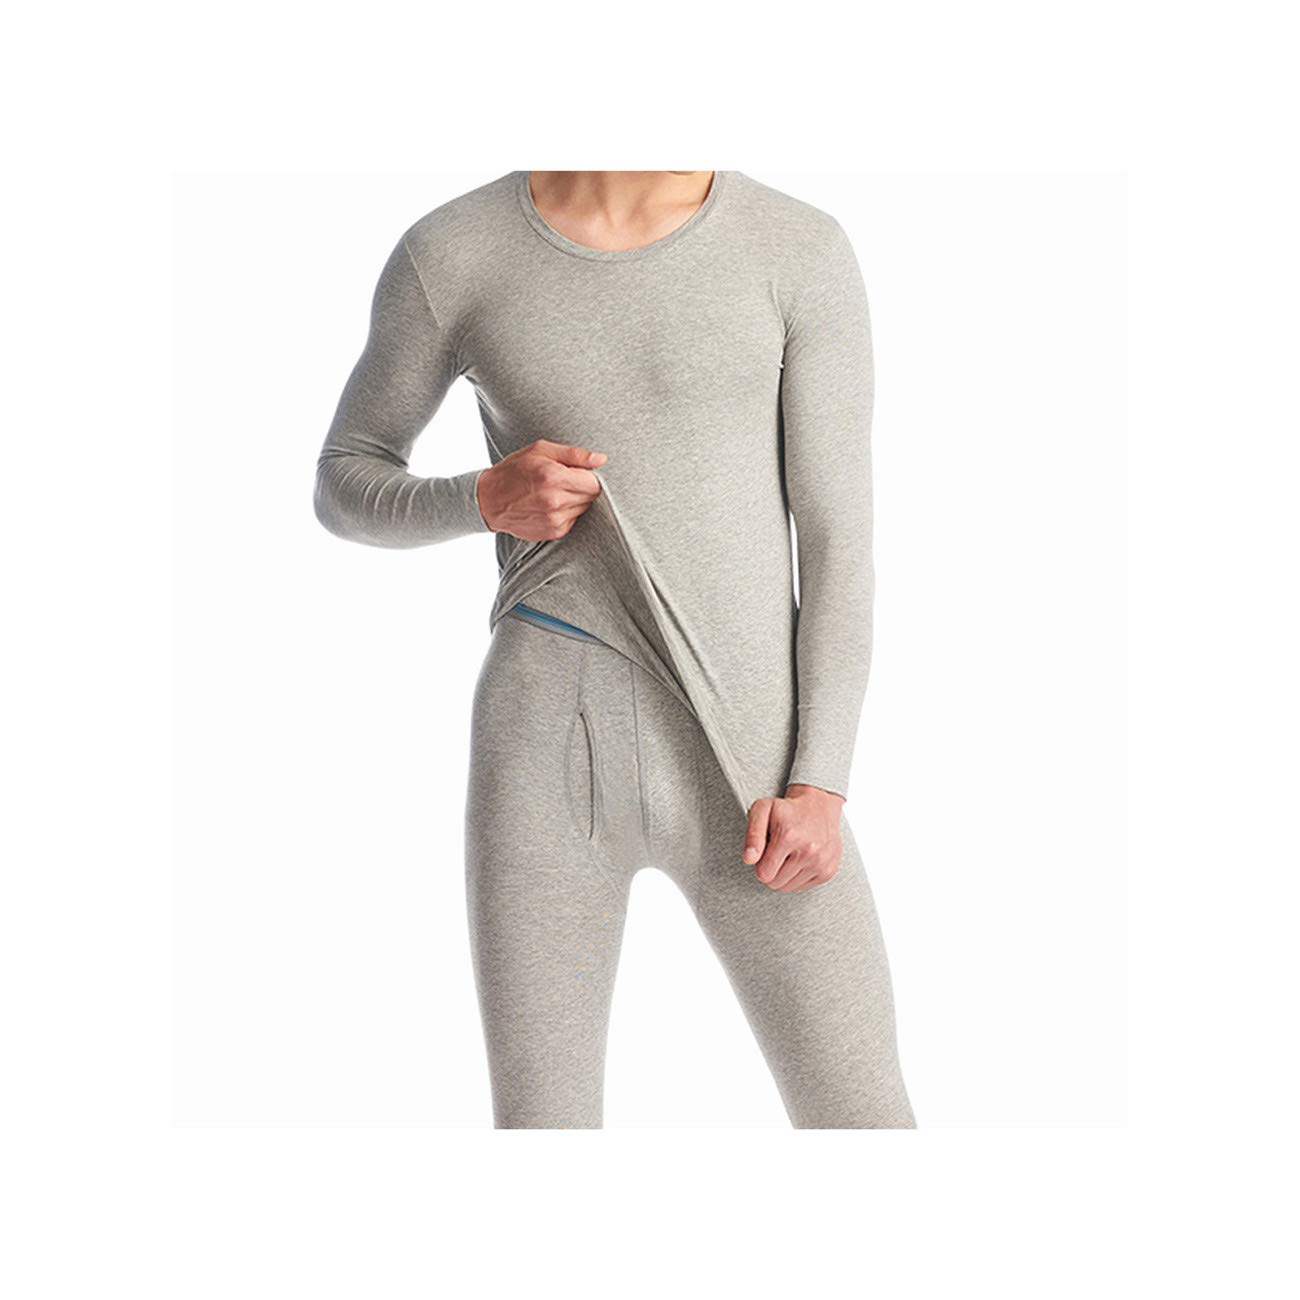 CHENGYA Cotton Men Round Neck Thermal Underwear Clothes Male Seamless Warm,Light Gray,XXL by CHENGYA